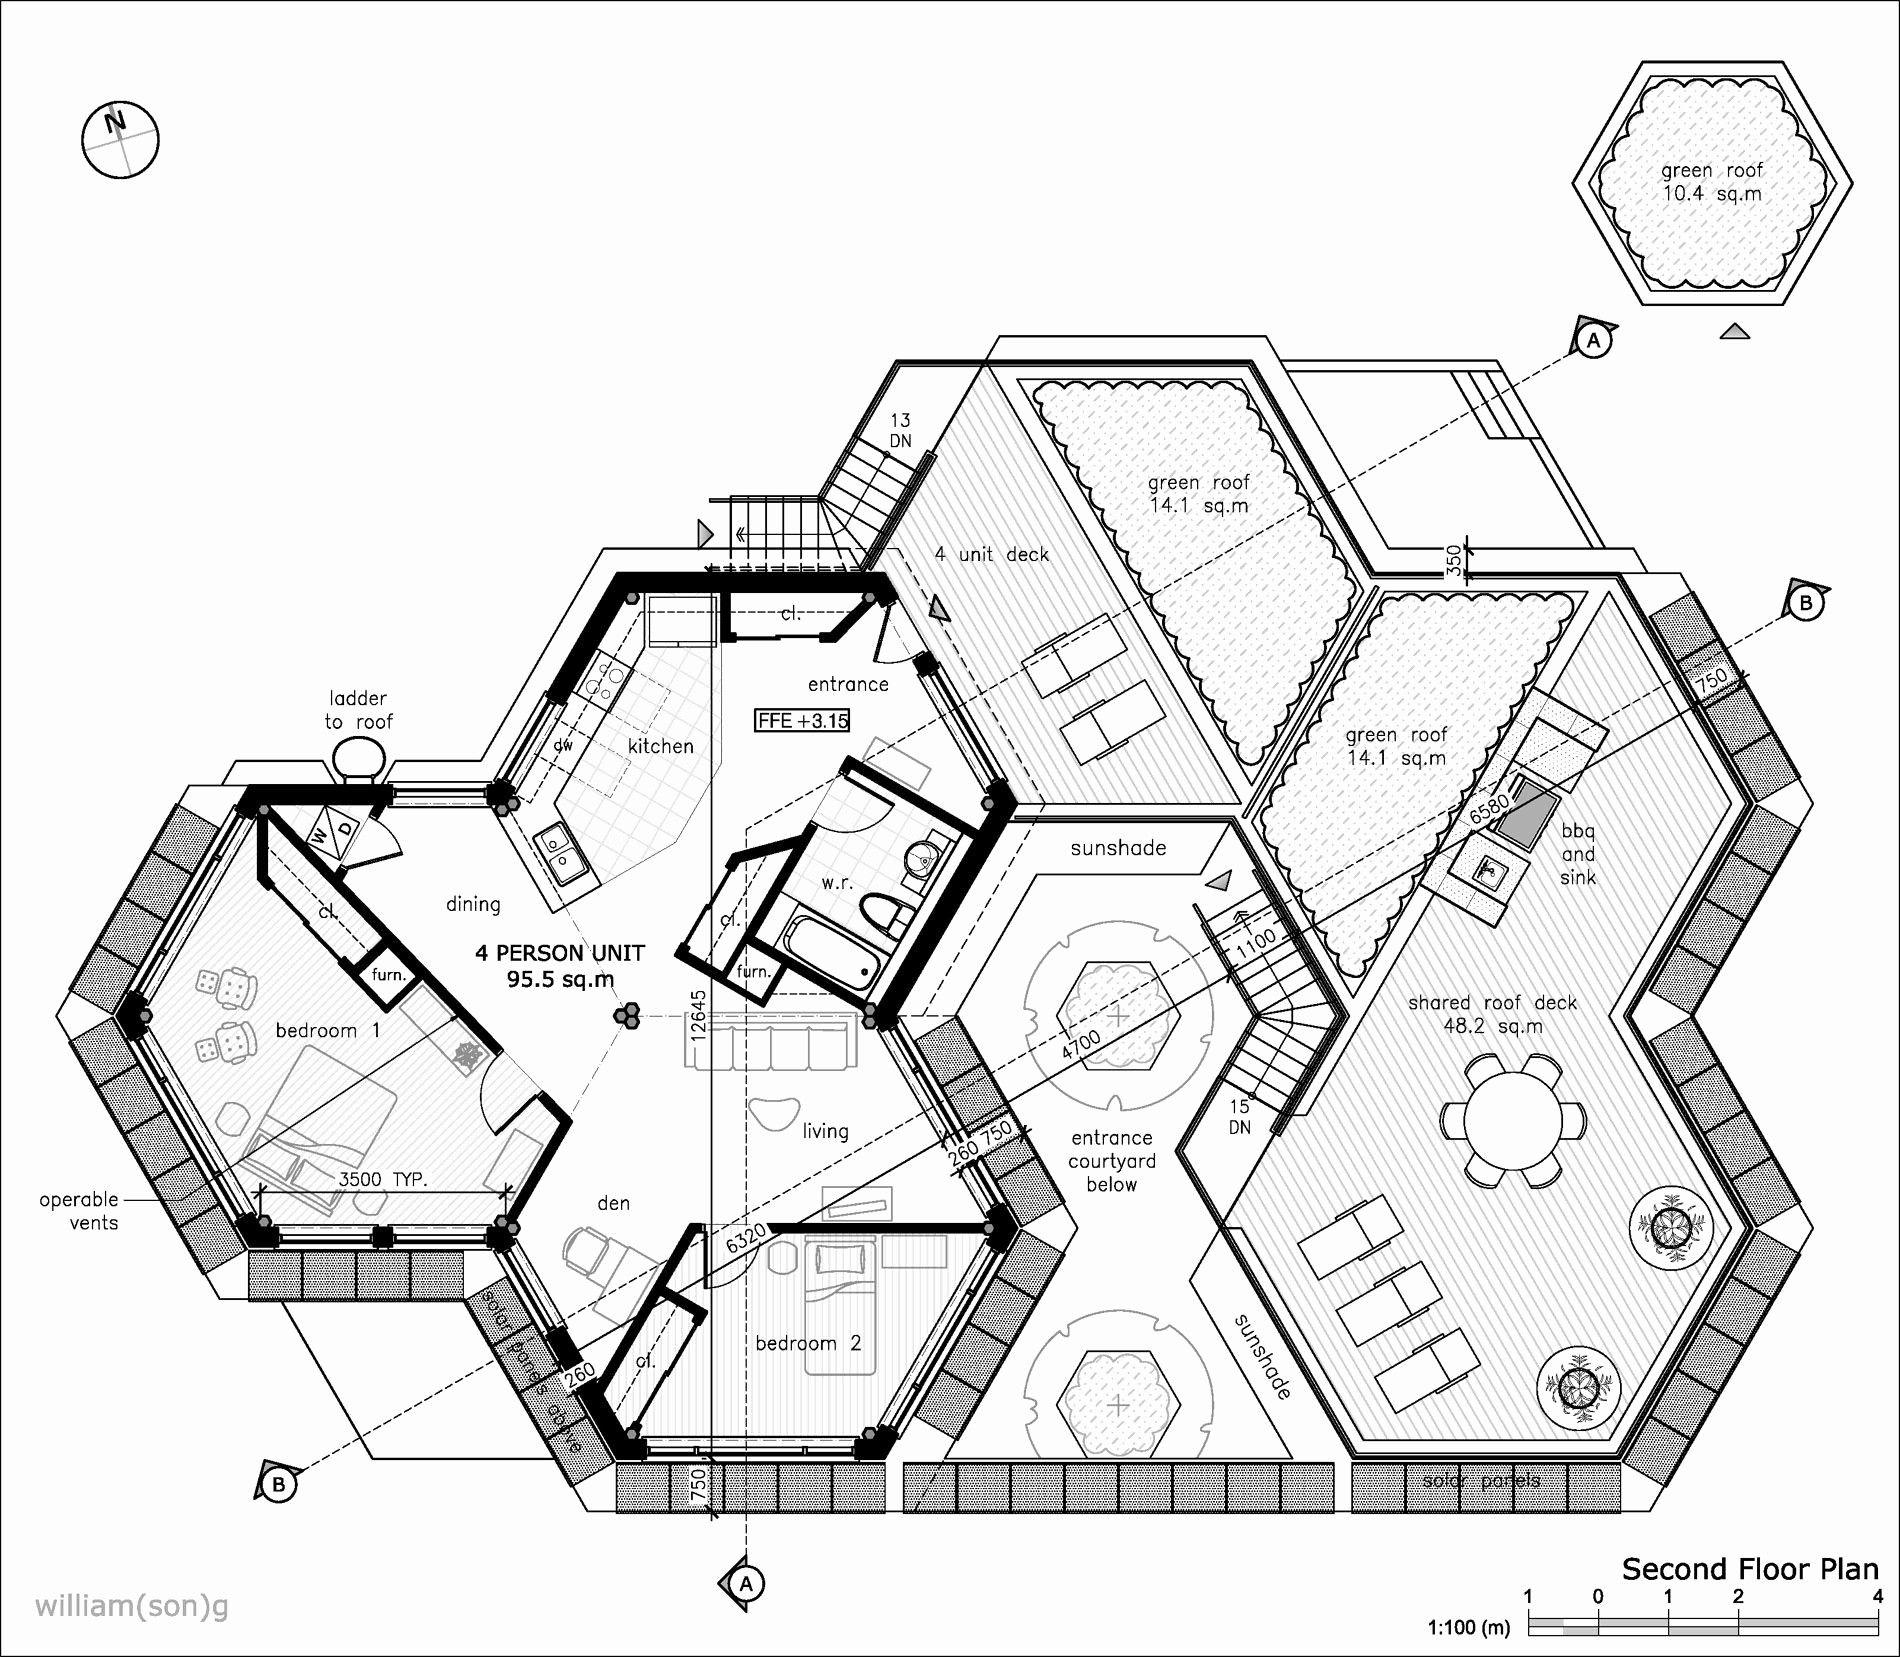 21 Draw Your Own Floor Plan Floor Plan Creator Inspirational Escalator Floor Plan Draw Sims 4 House Design House Floor Plans Tiny House Floor Plans